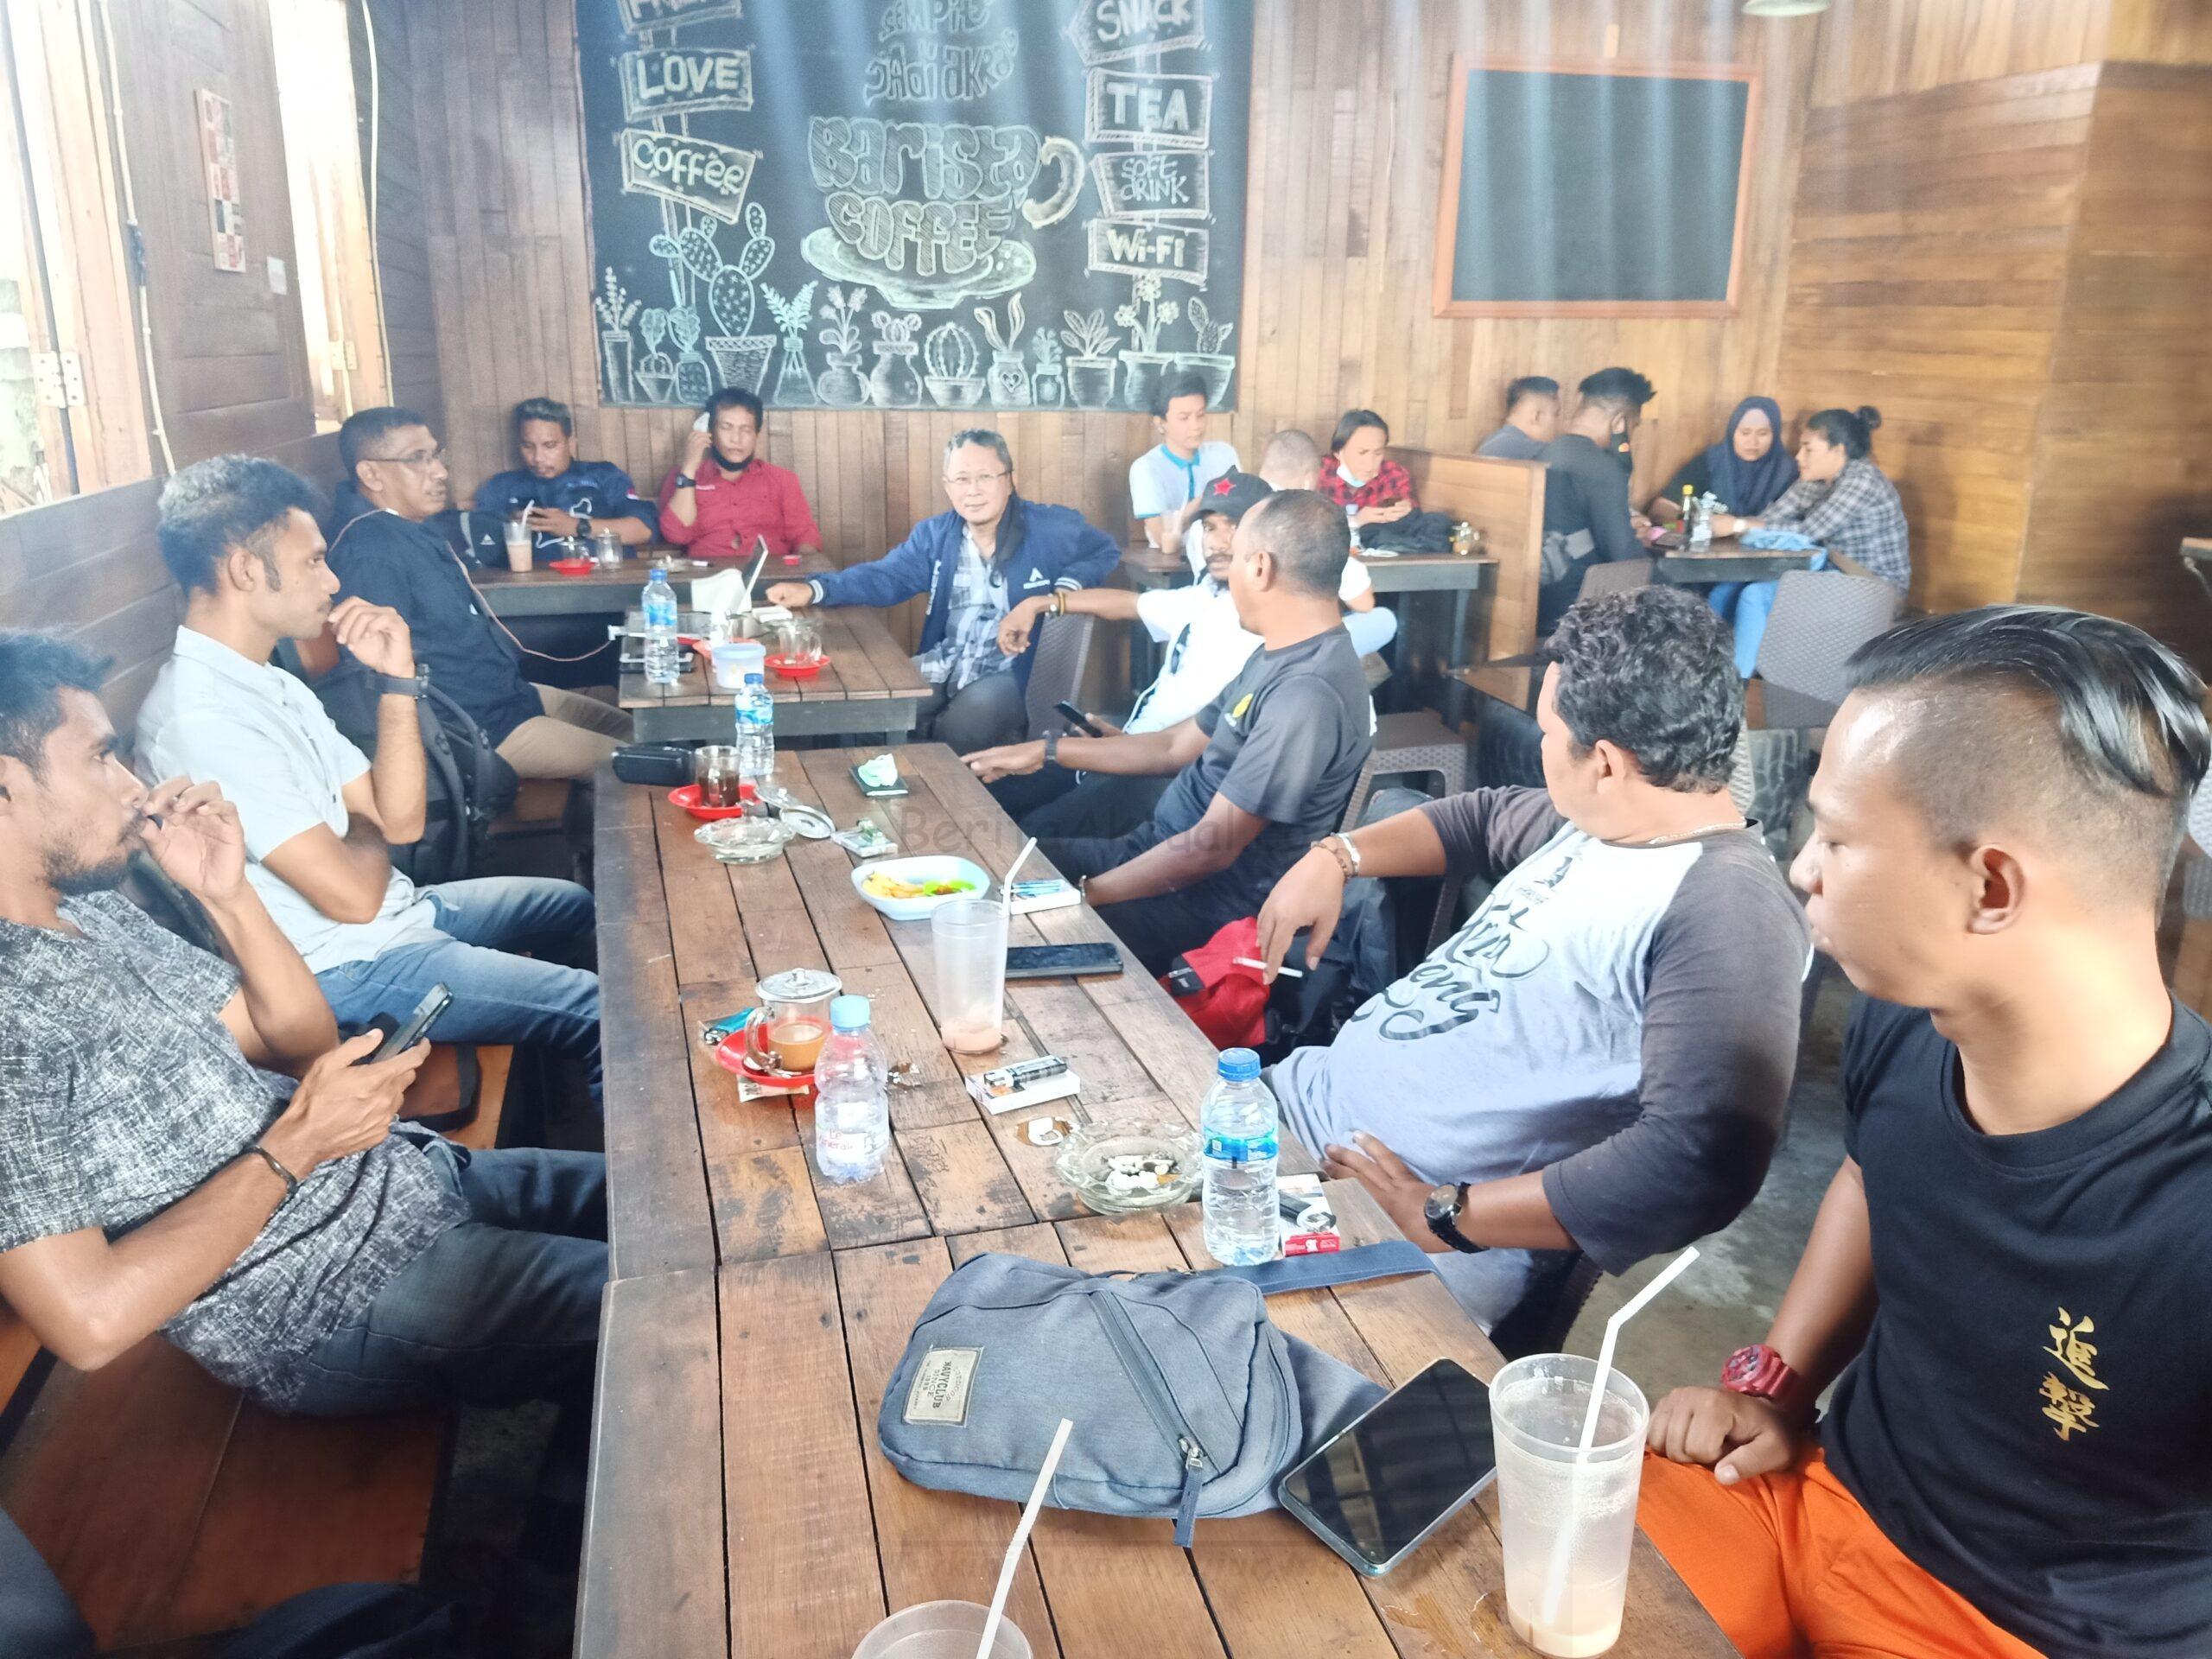 Basarnas Manokwari Coffee Break Bersama Insan Pers 18 IMG20210315162239 scaled